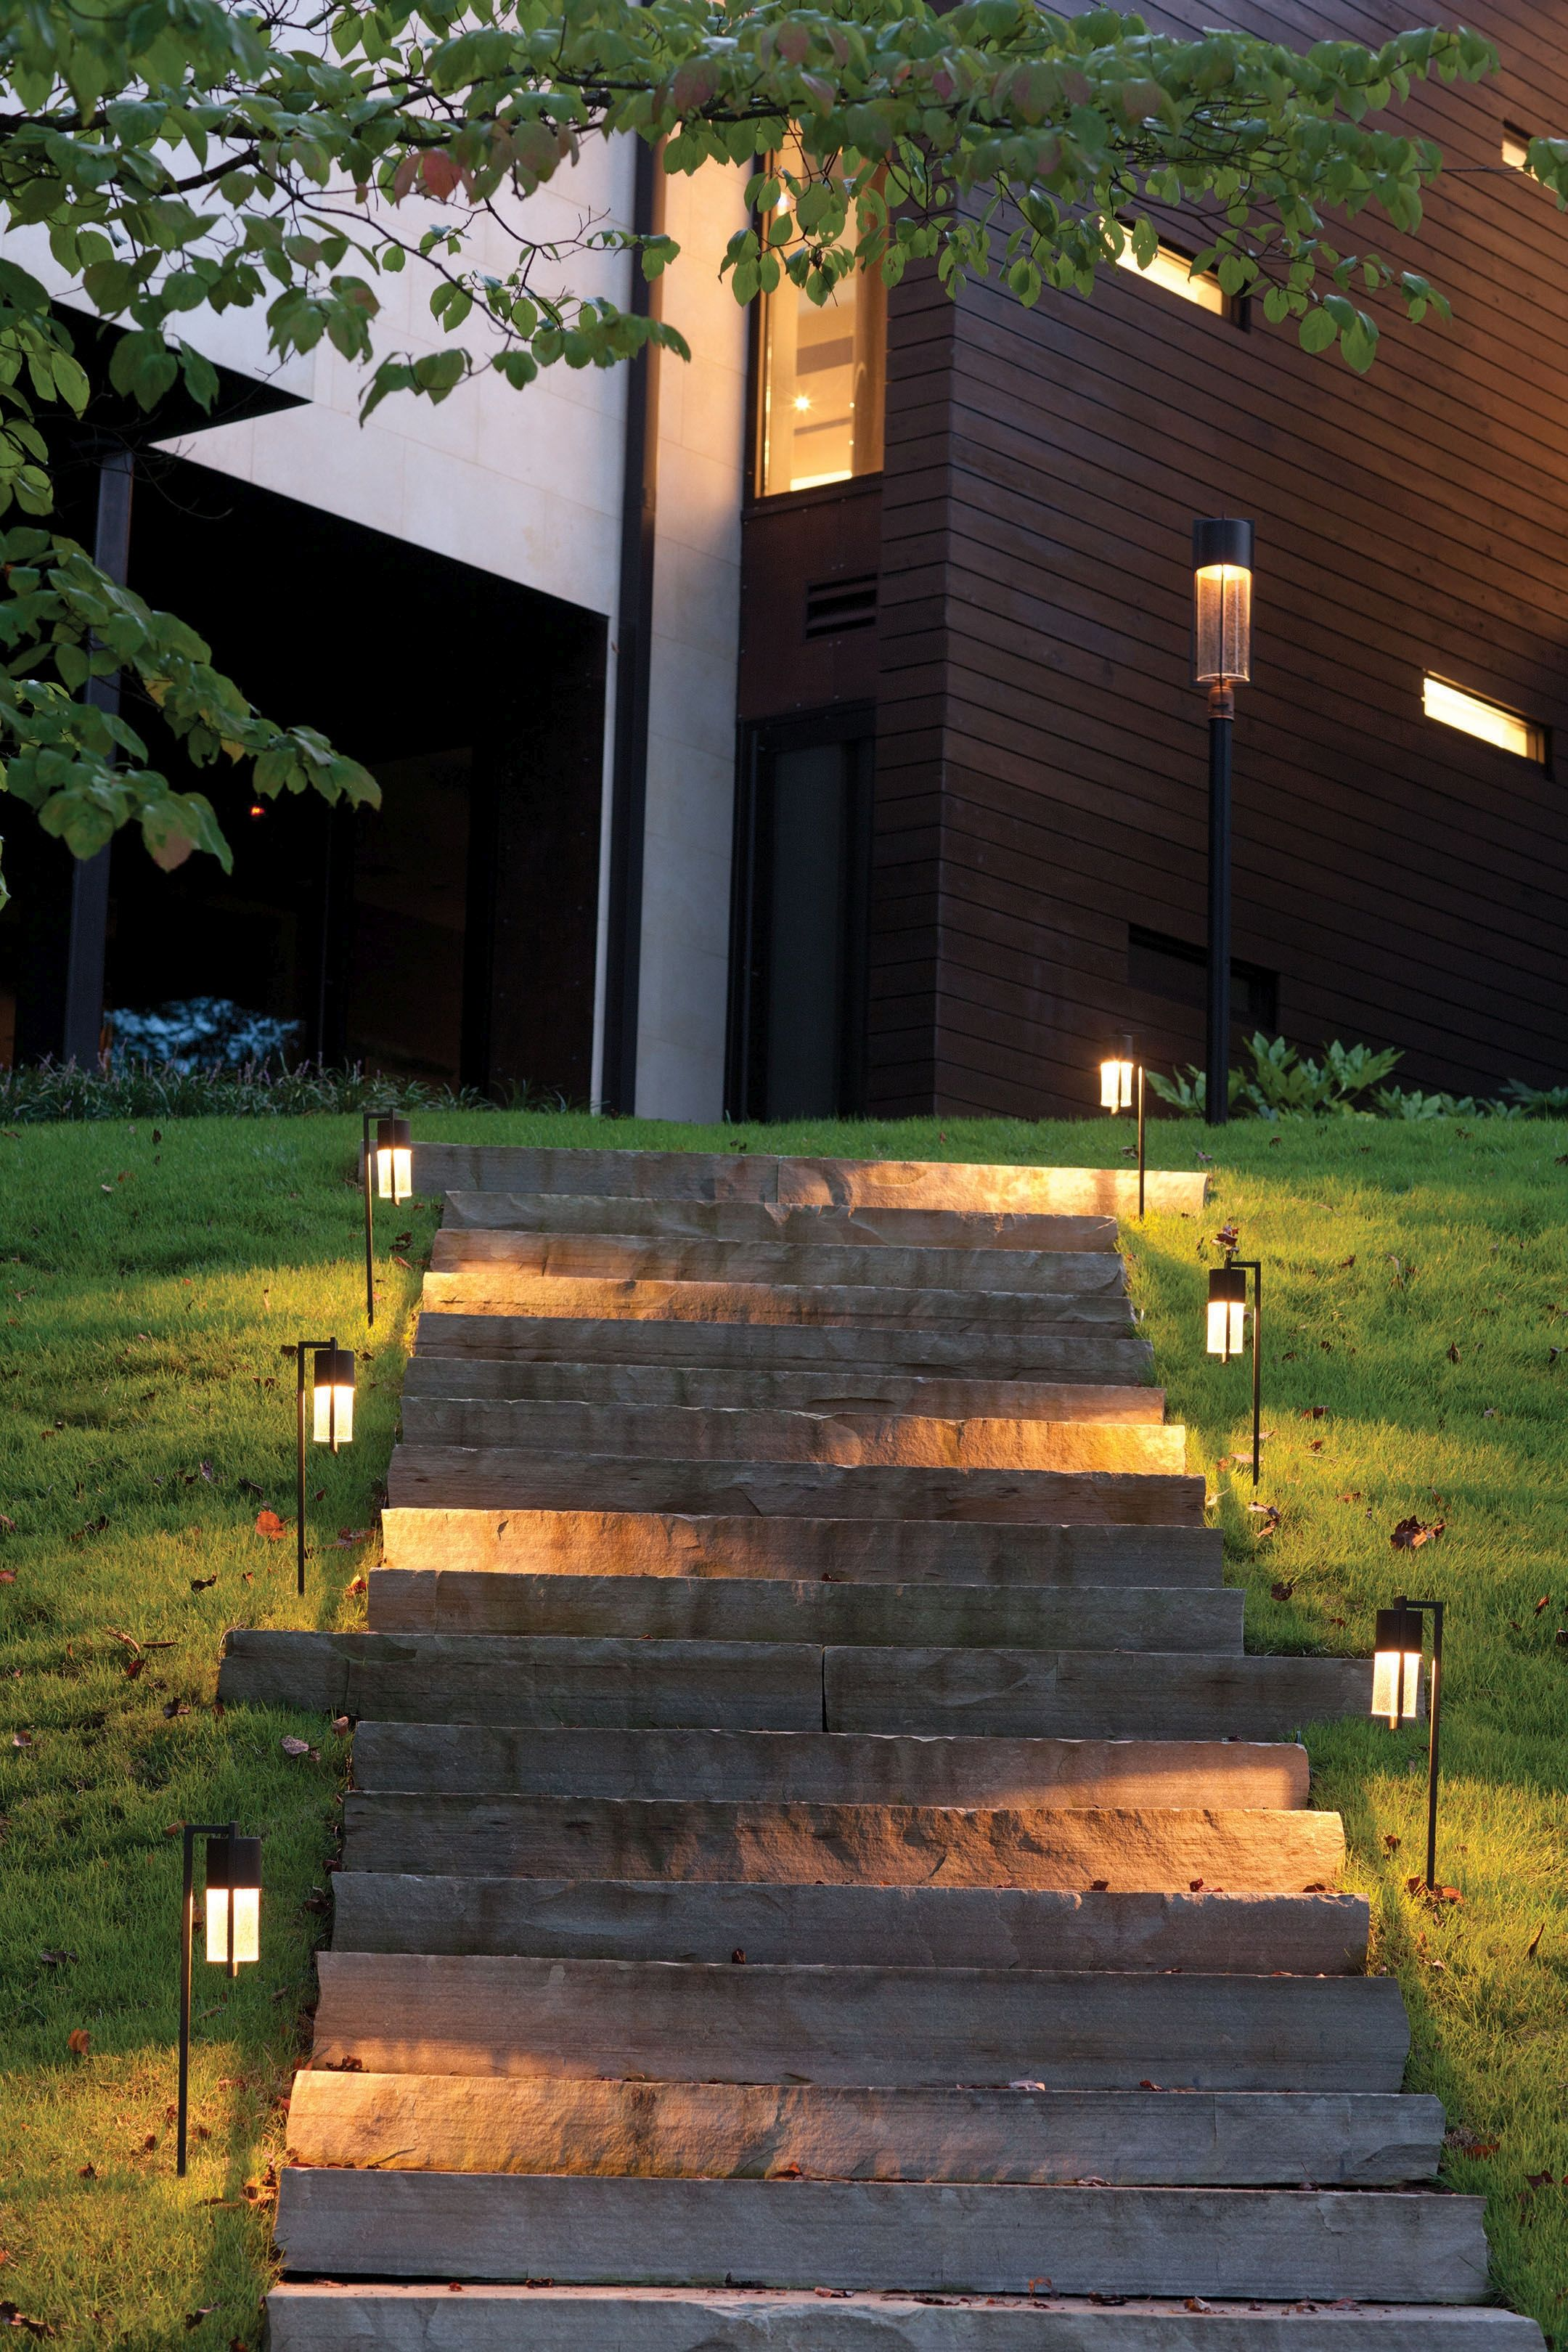 Hinkley Shelter Landscape Path Lights Outdoor Pathway Lighting Outdoor Post Lights Garden Path Lighting